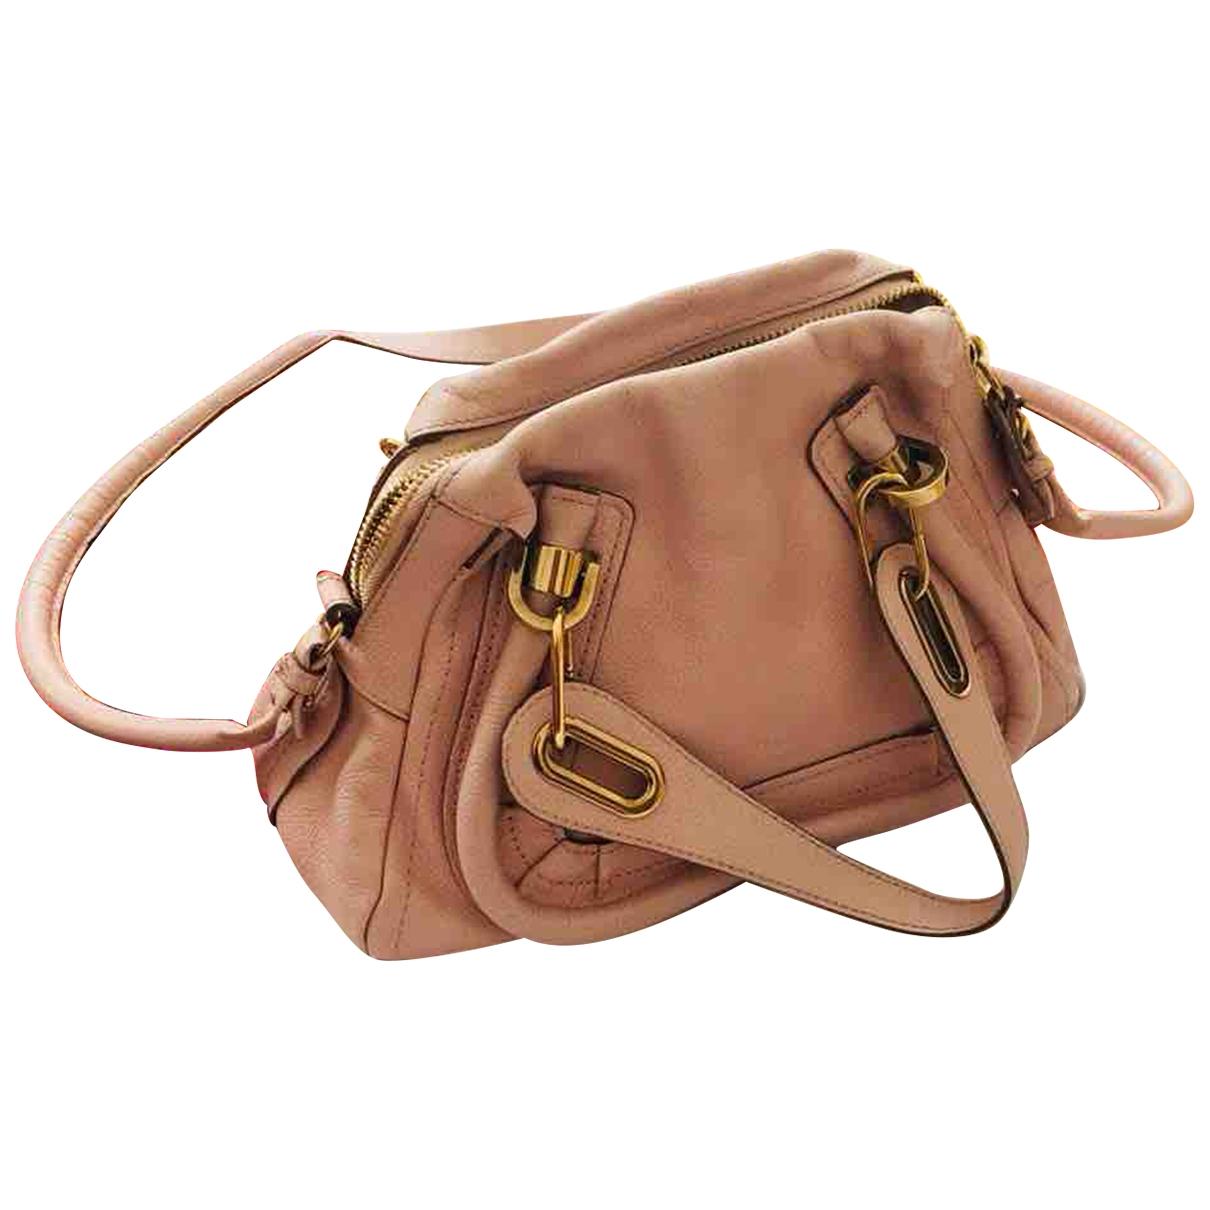 Chloe Paraty Handtasche in  Rosa Leder